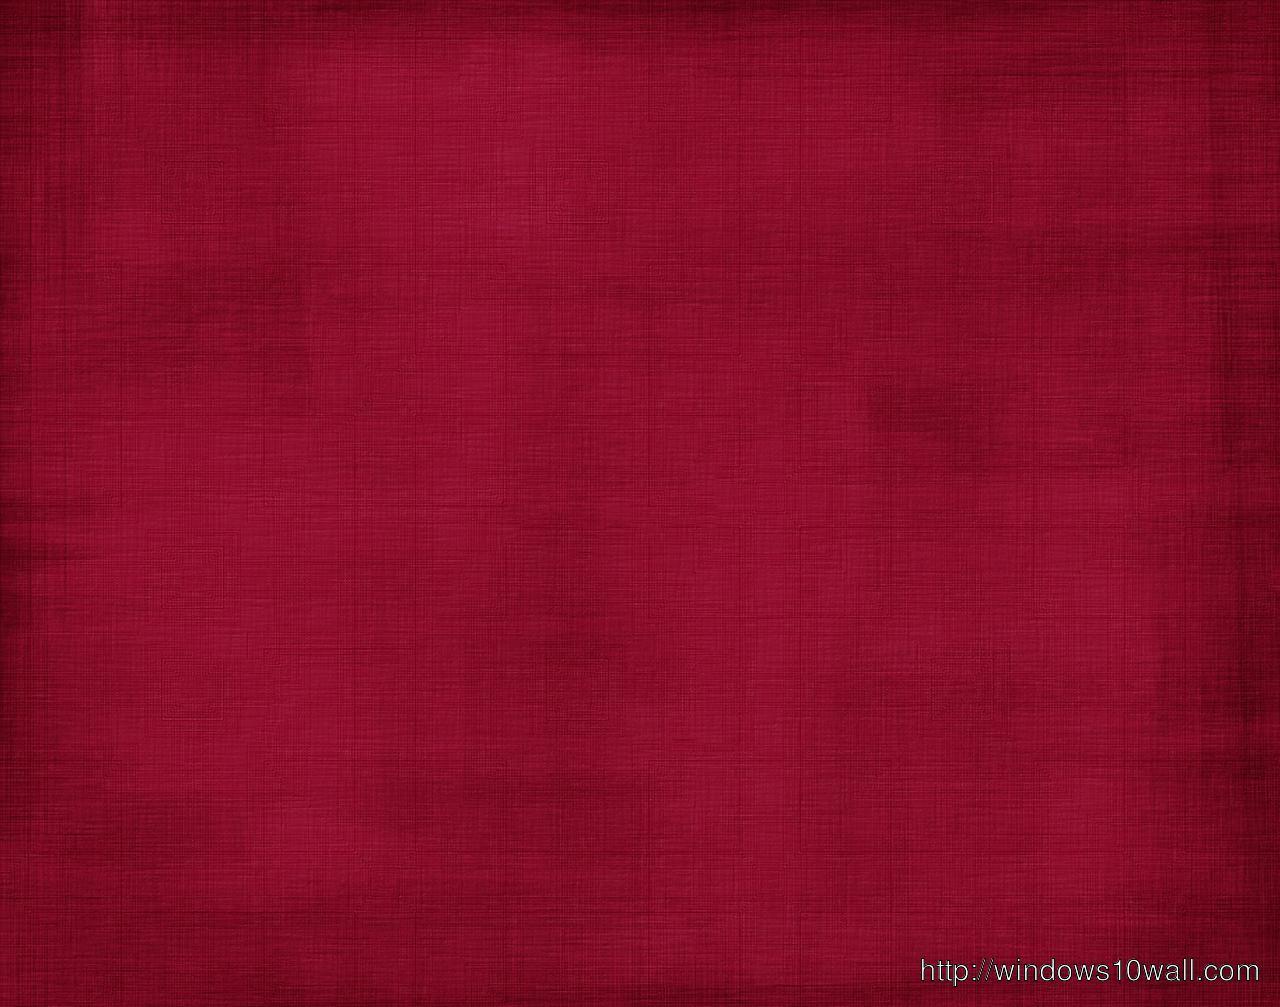 Burgundy Background Wallpaper Windows 10 Wallpapers